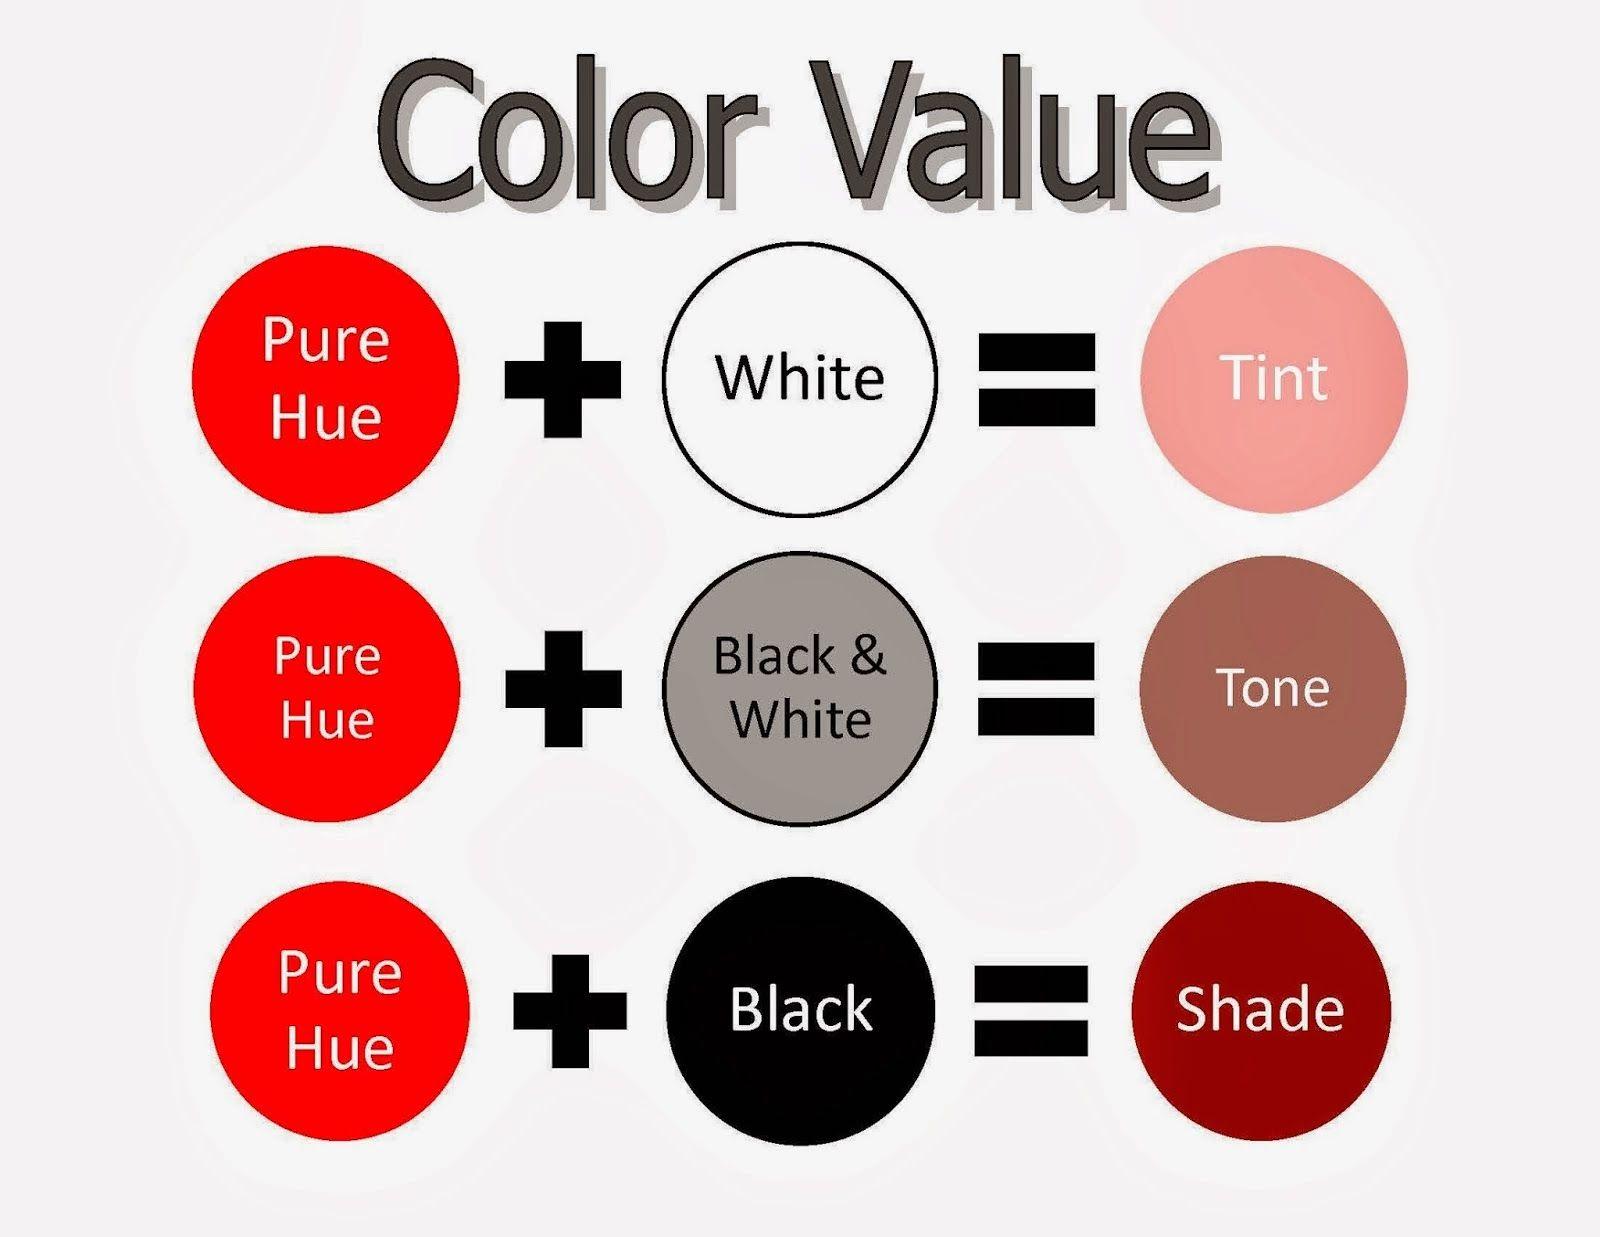 Hue Tint Tone Shade Color Theory 2 Color Mixing